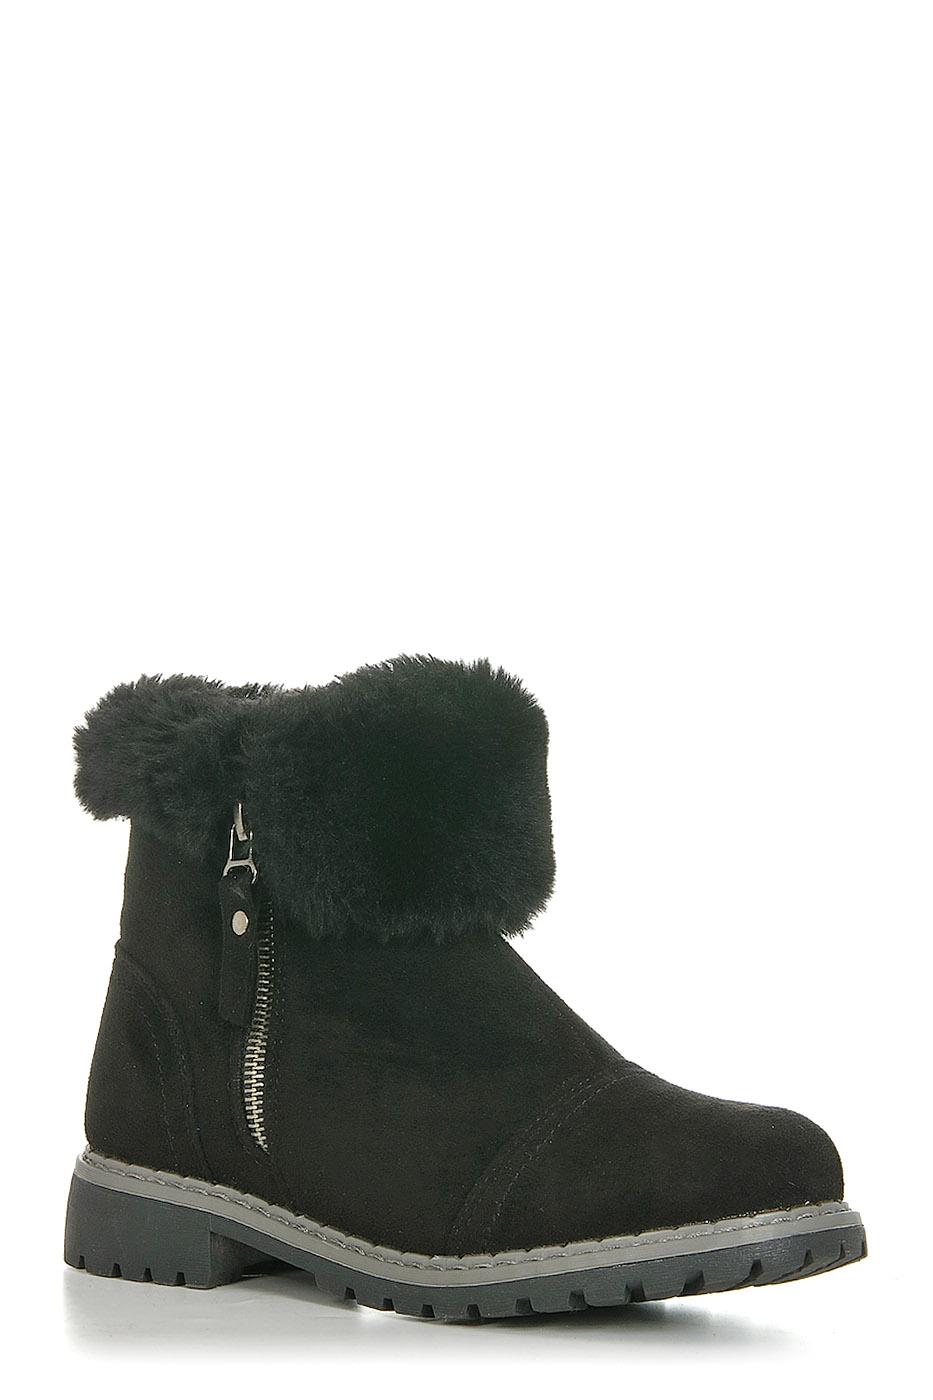 Ботинки TOPLAND2352-PB76153B/BLACK